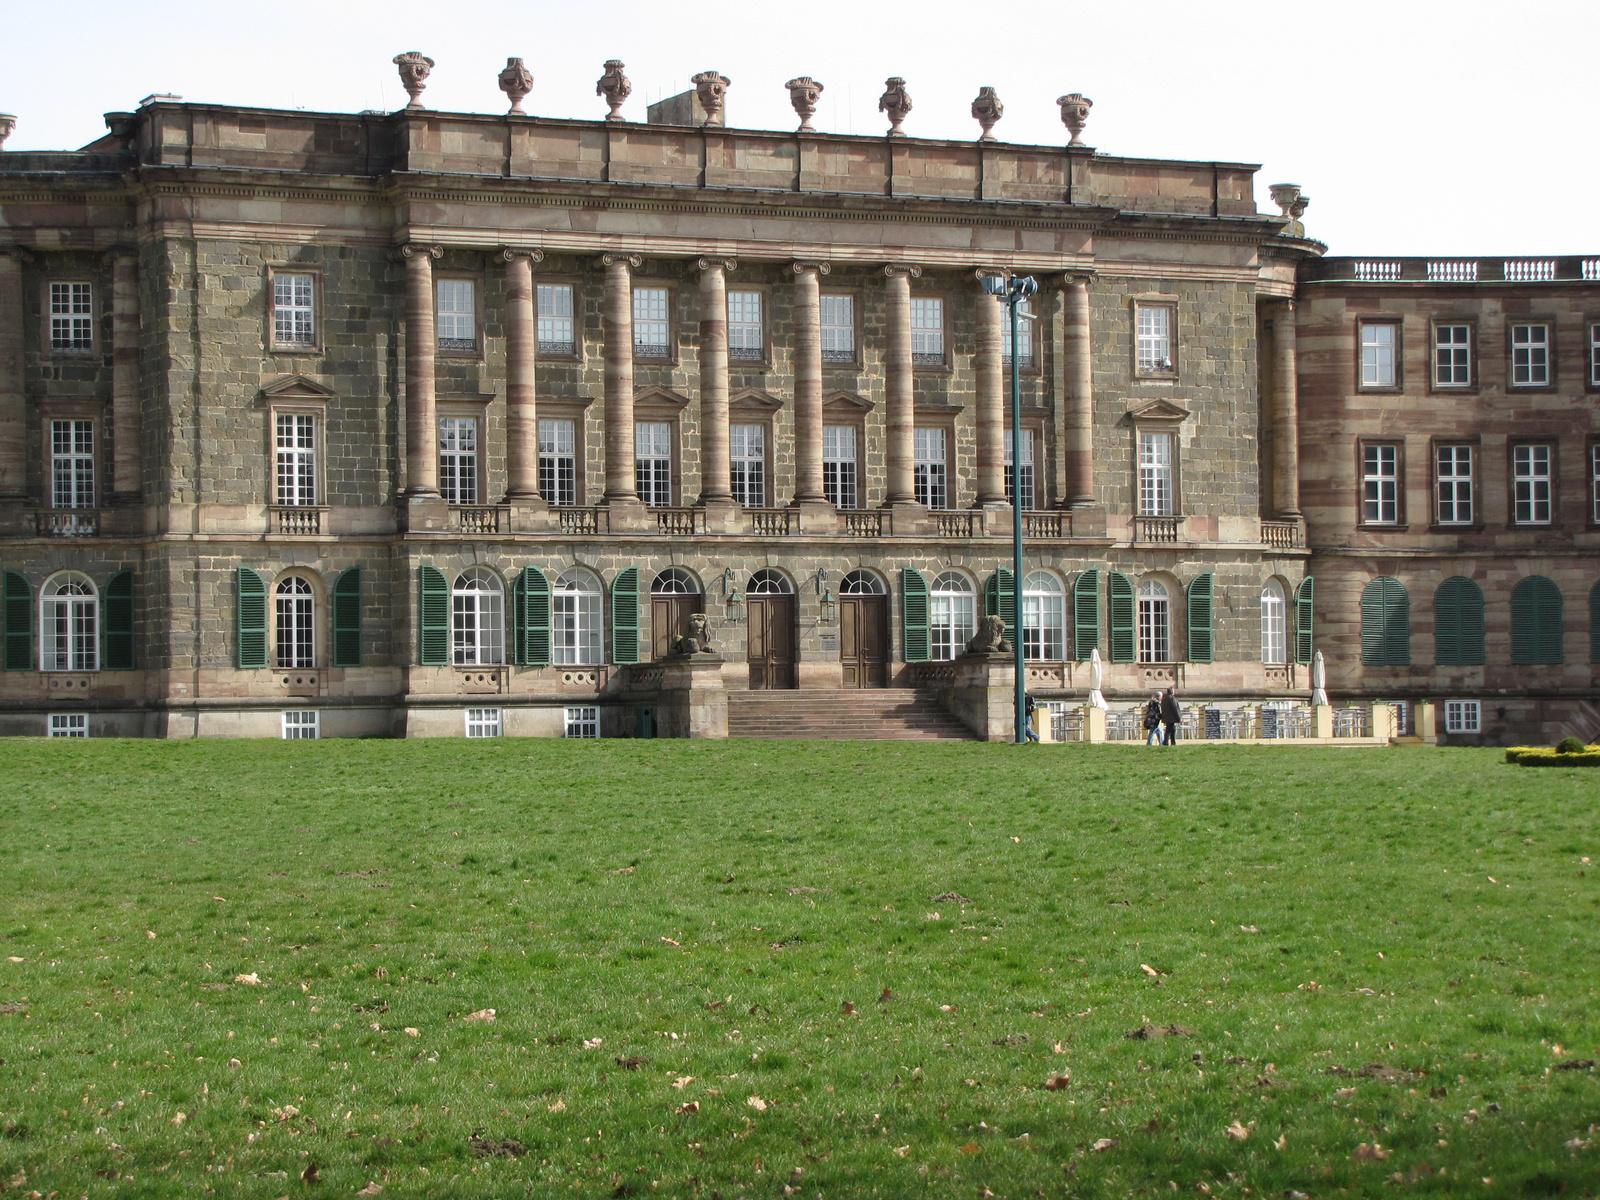 Kassel, Bergpark Wilhelmshöhe, Schloß Wilhelmshöhe, SzG3